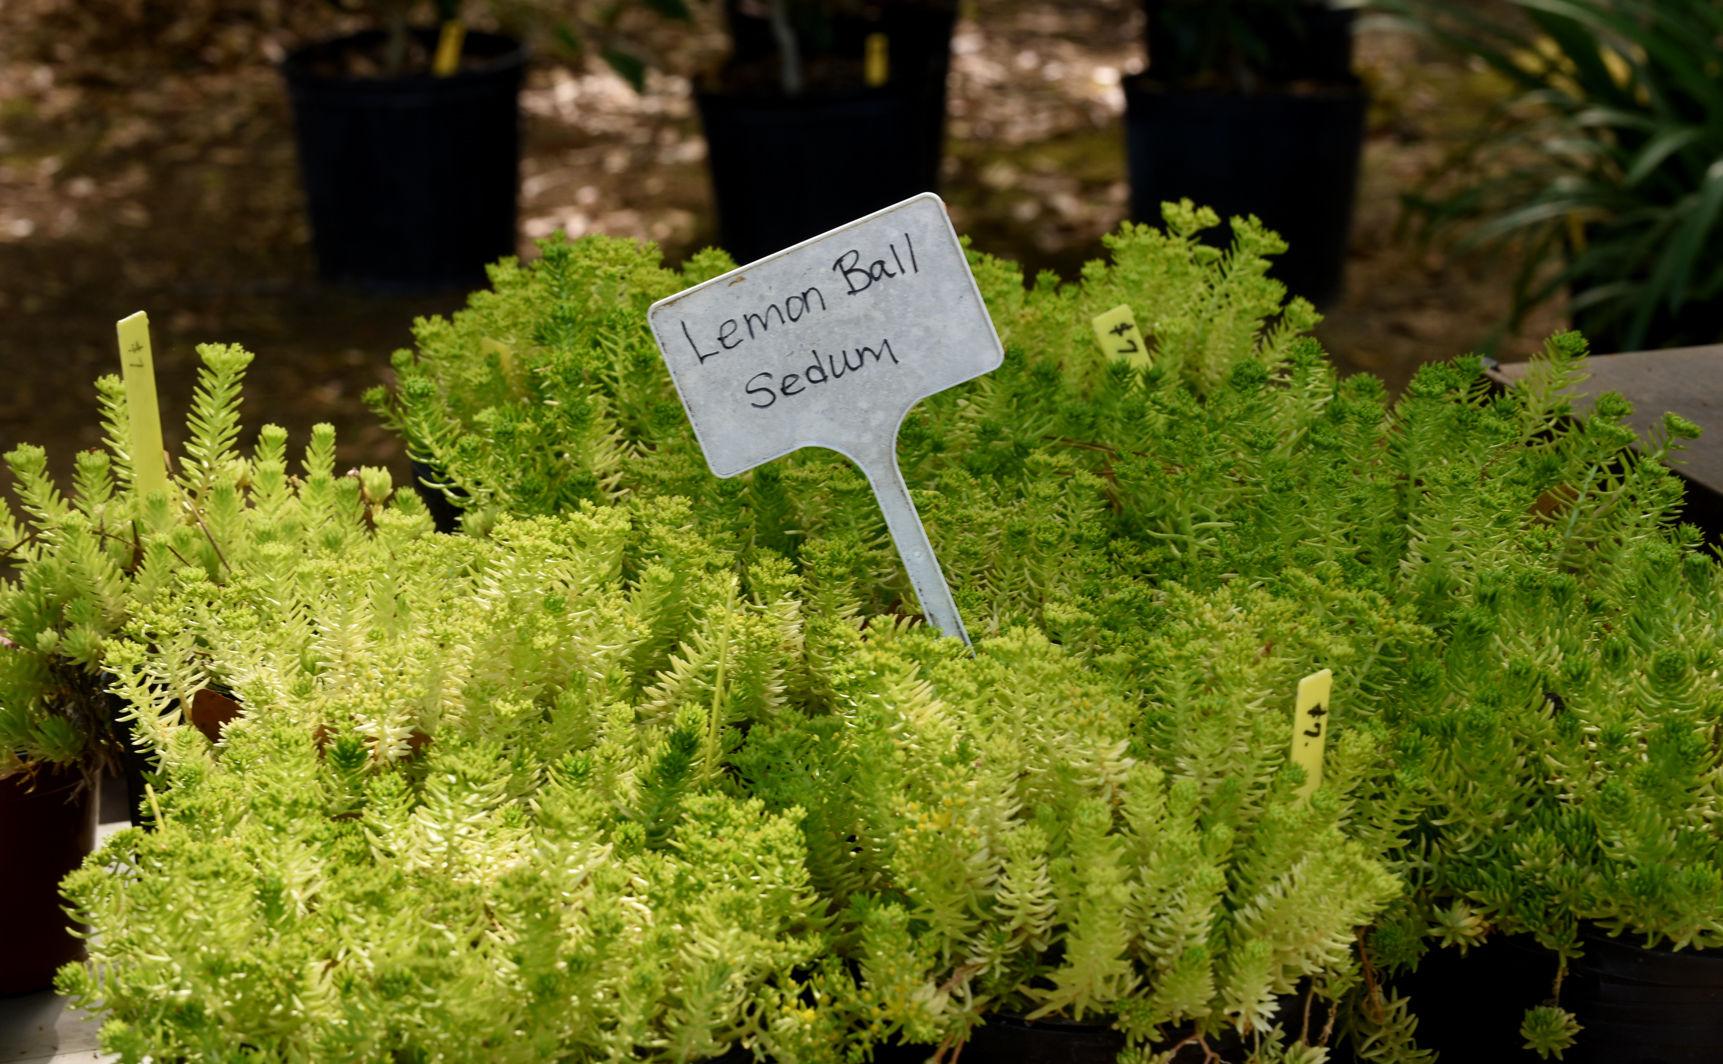 Dothan Area Botanical Gardens Holds Annual Plant Sale | Local |  Dothaneagle.com